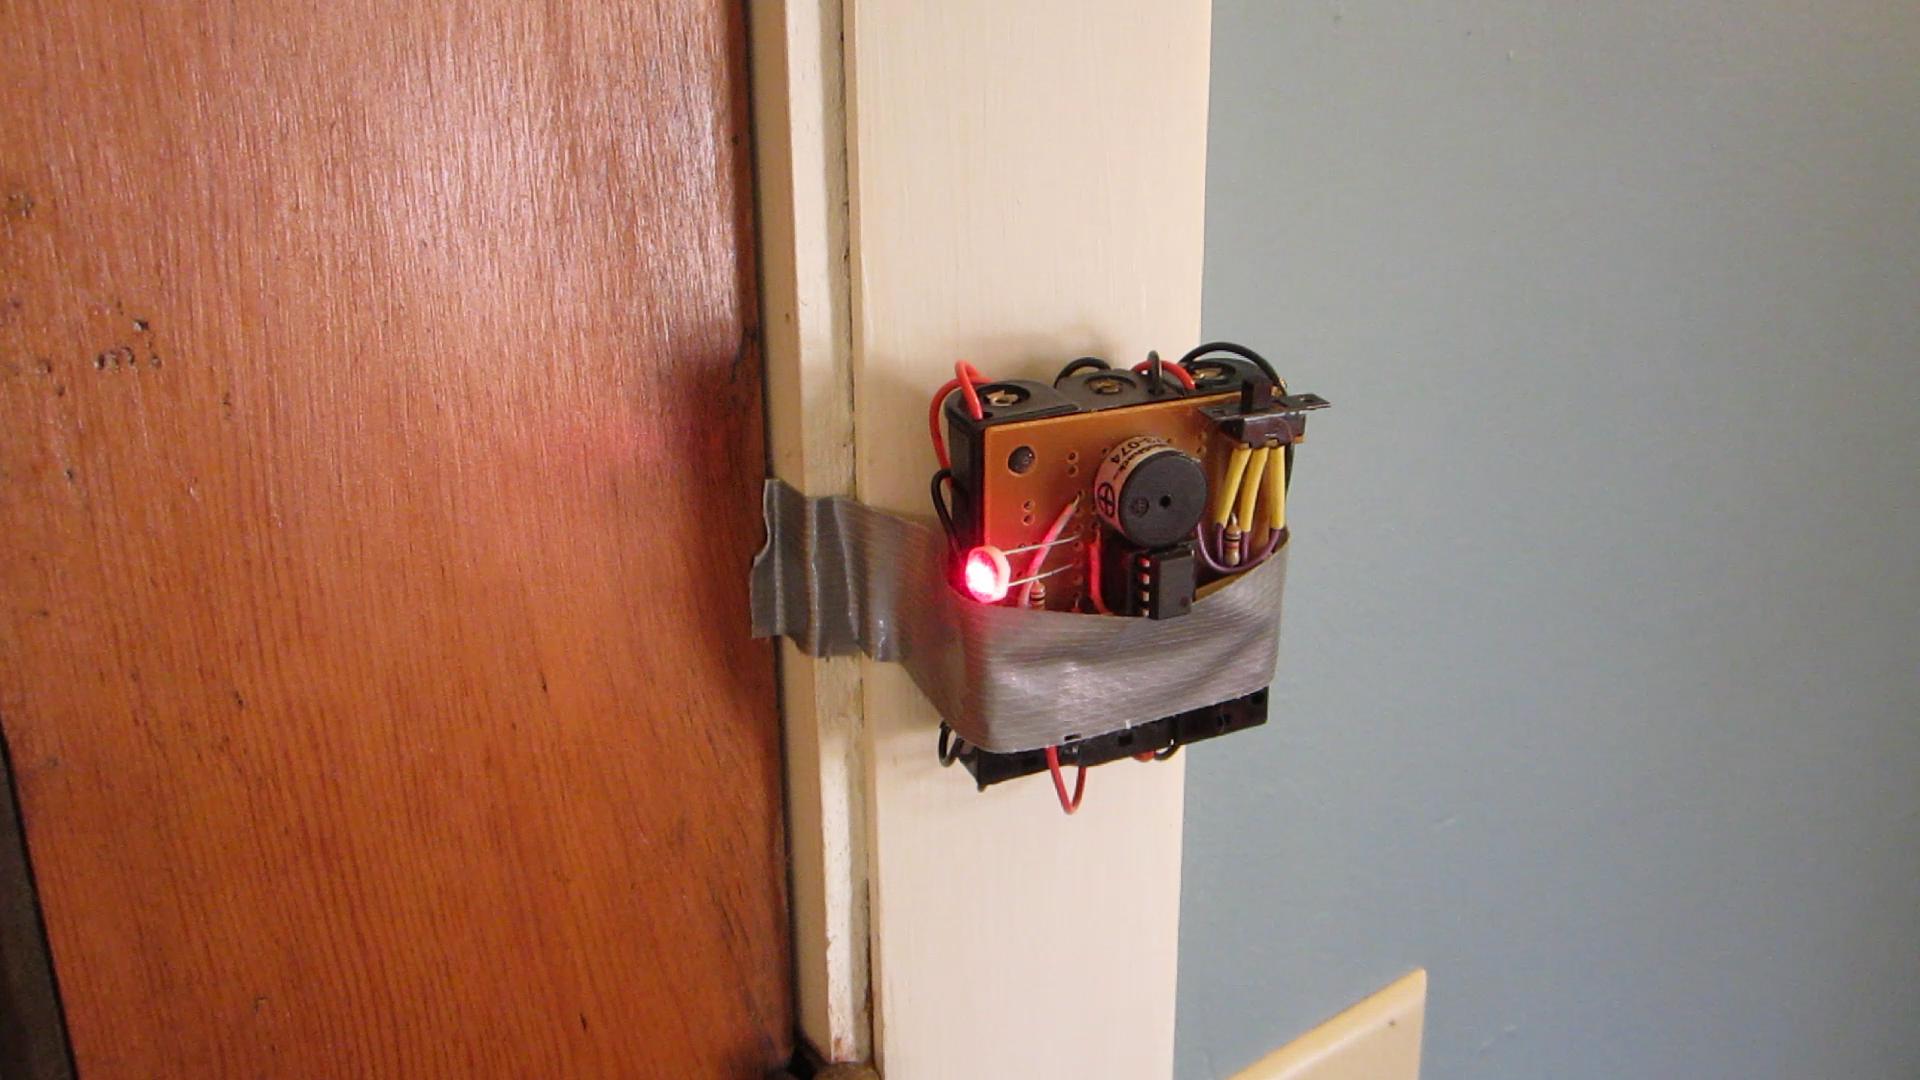 Build A Simple Laser Tripwire Alarm Make